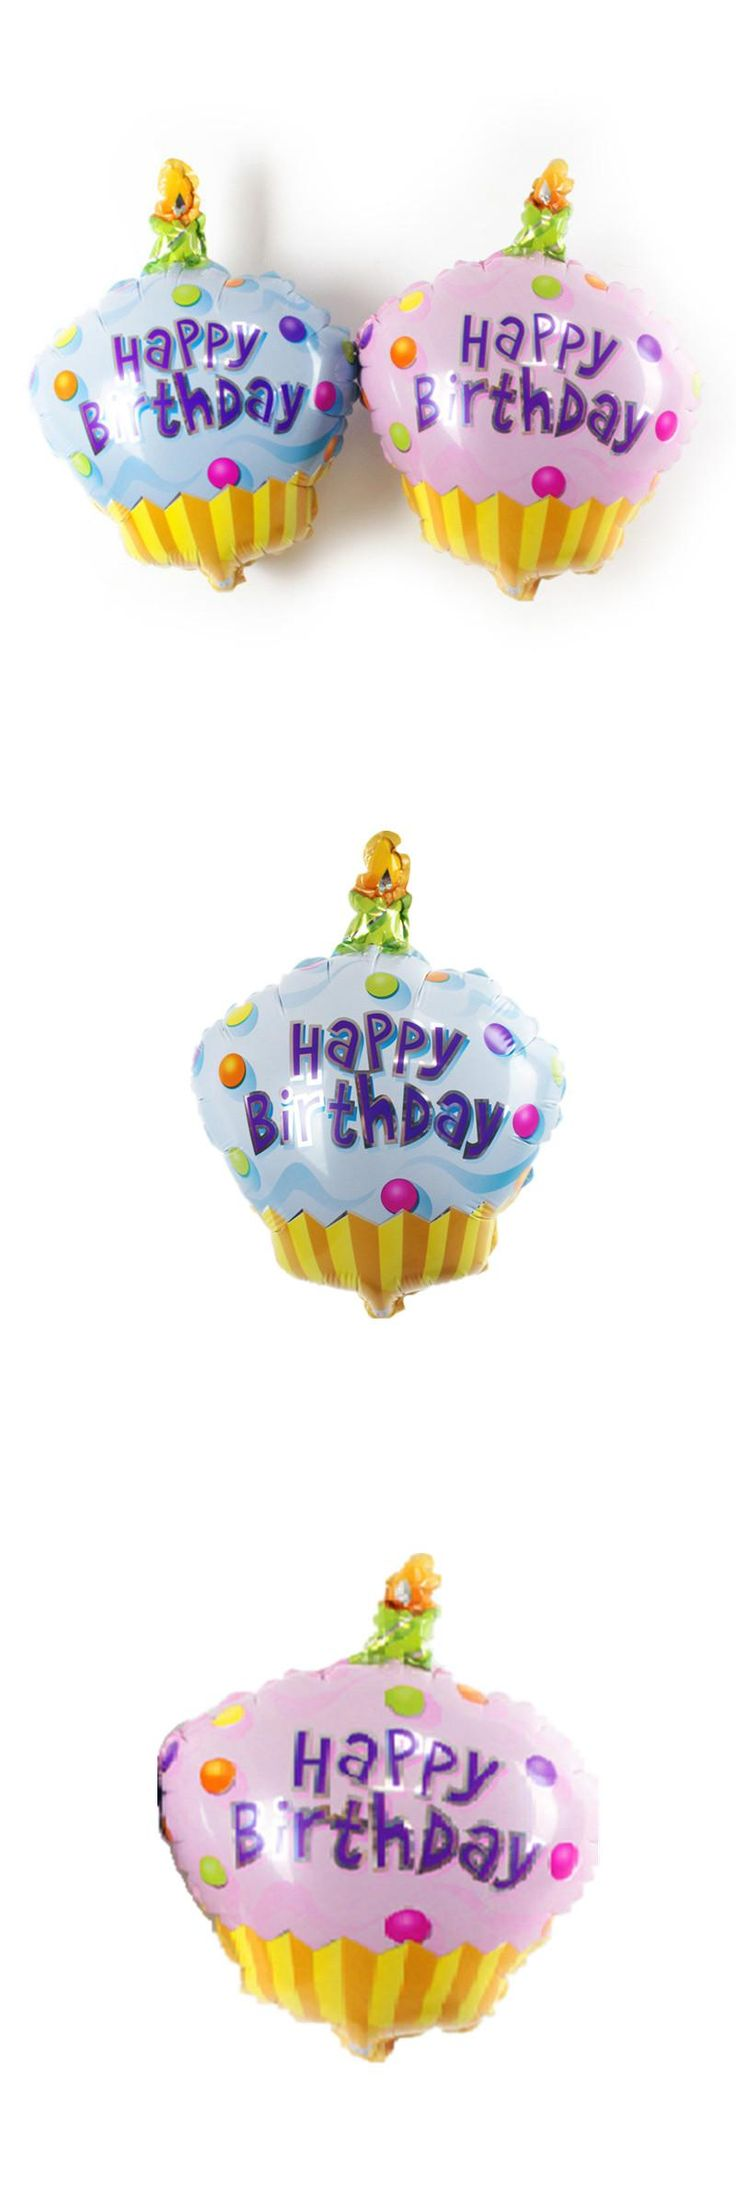 [Visit to Buy] BINGTIAN new Aluminum Foil Balloons Happy Birthday cake Balloon Decoration ceremony palloncini globos de helio infantiles #Advertisement